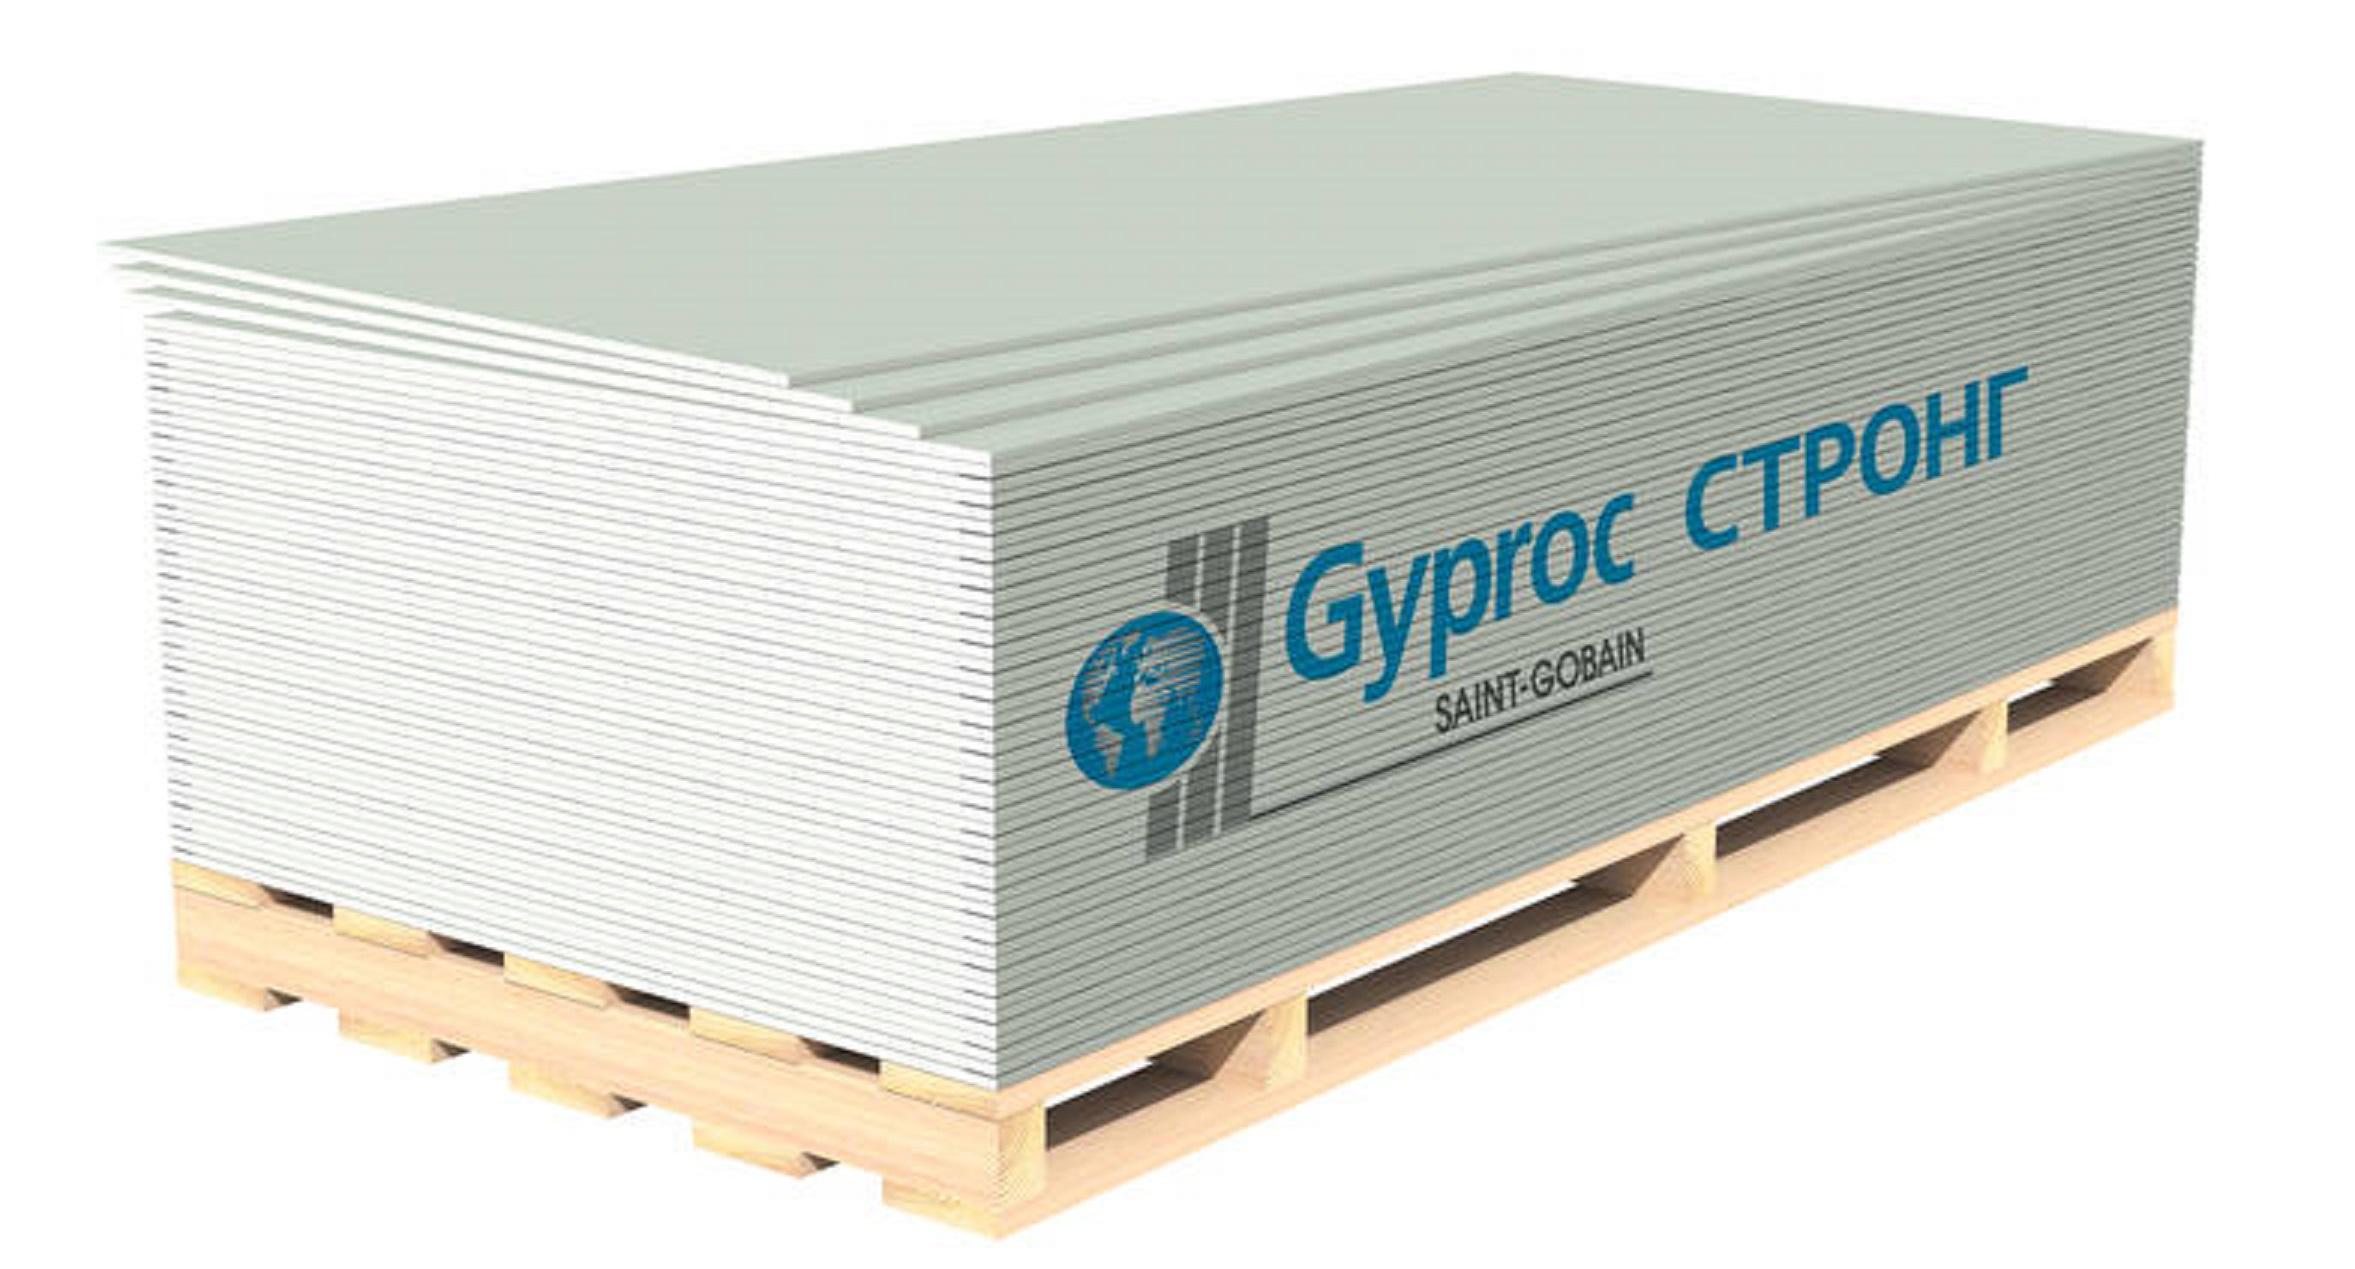 Гипсокартон GYPROC СТРОНГ 3000*1200*15 мм - фото